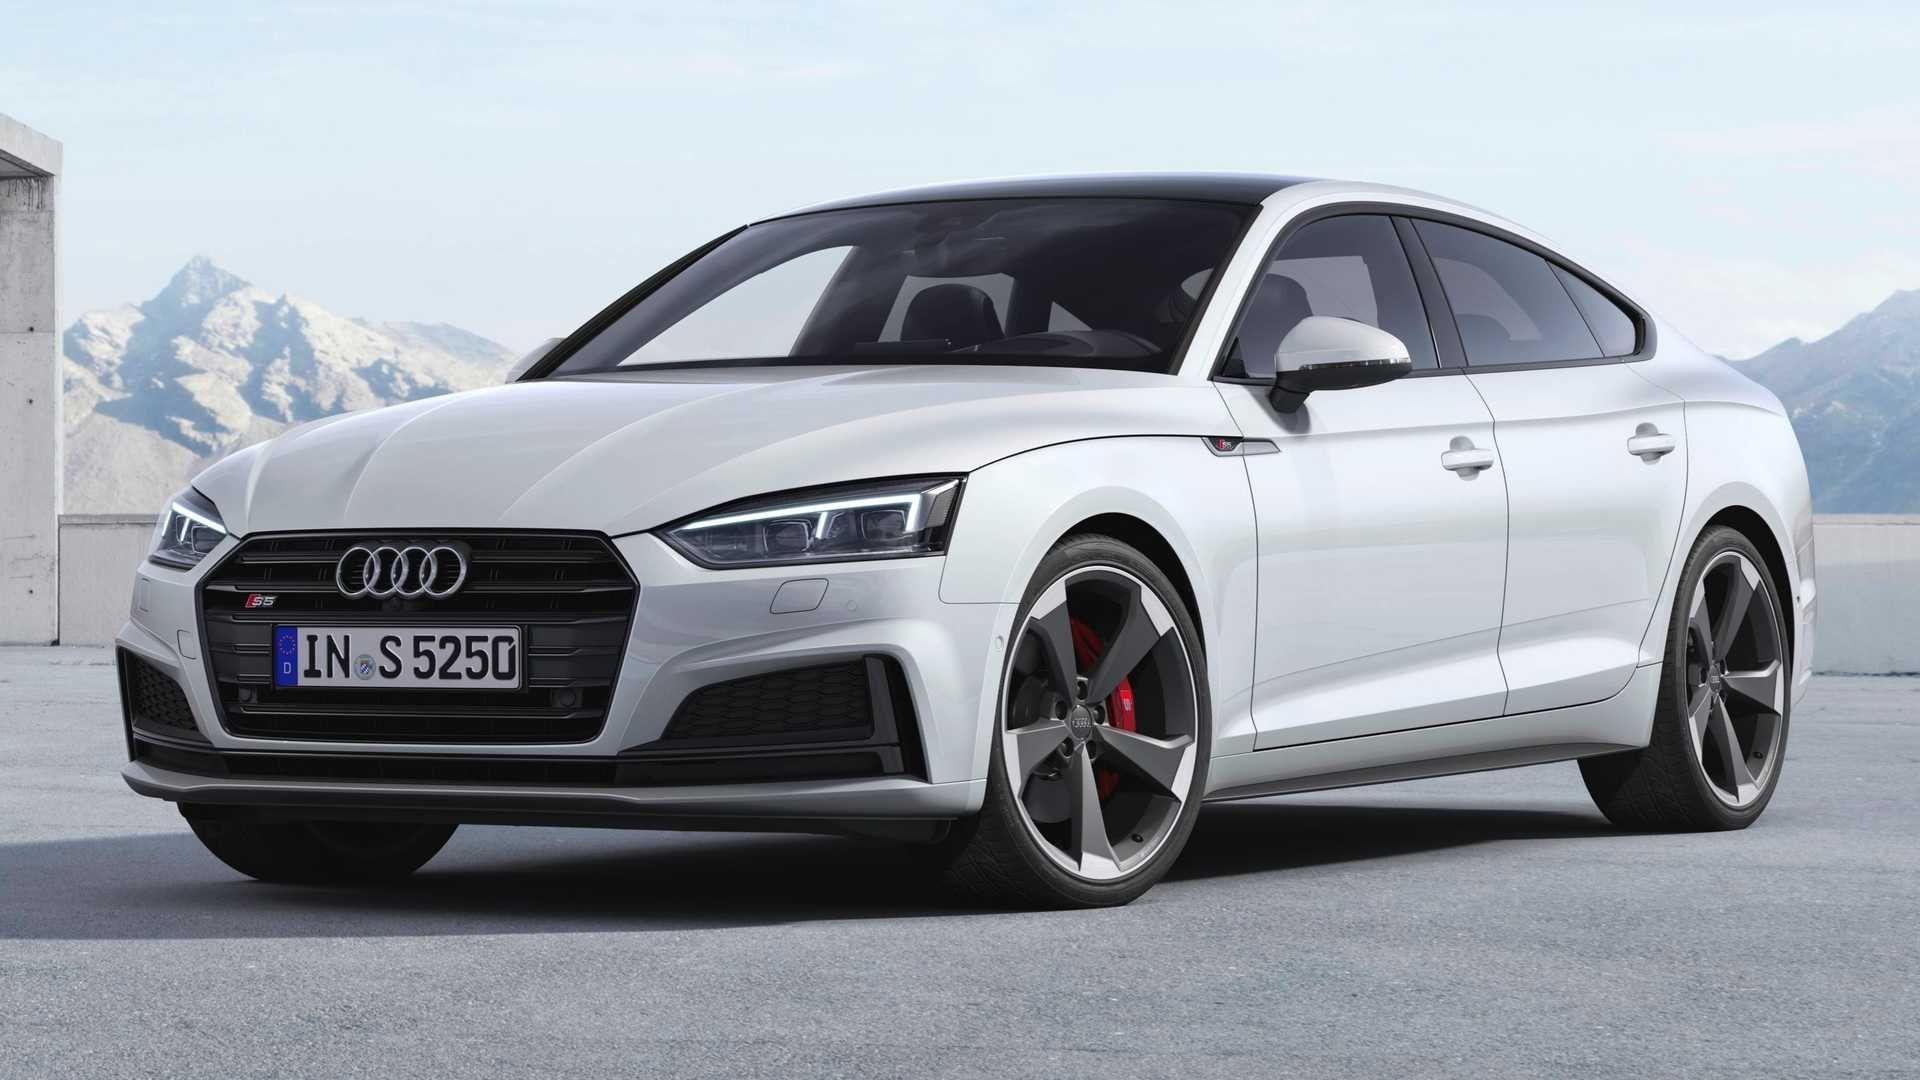 2020 Audi S5 Cabriolet Picture In 2020 Audi S5 Audi Rs5 Audi S5 Sportback